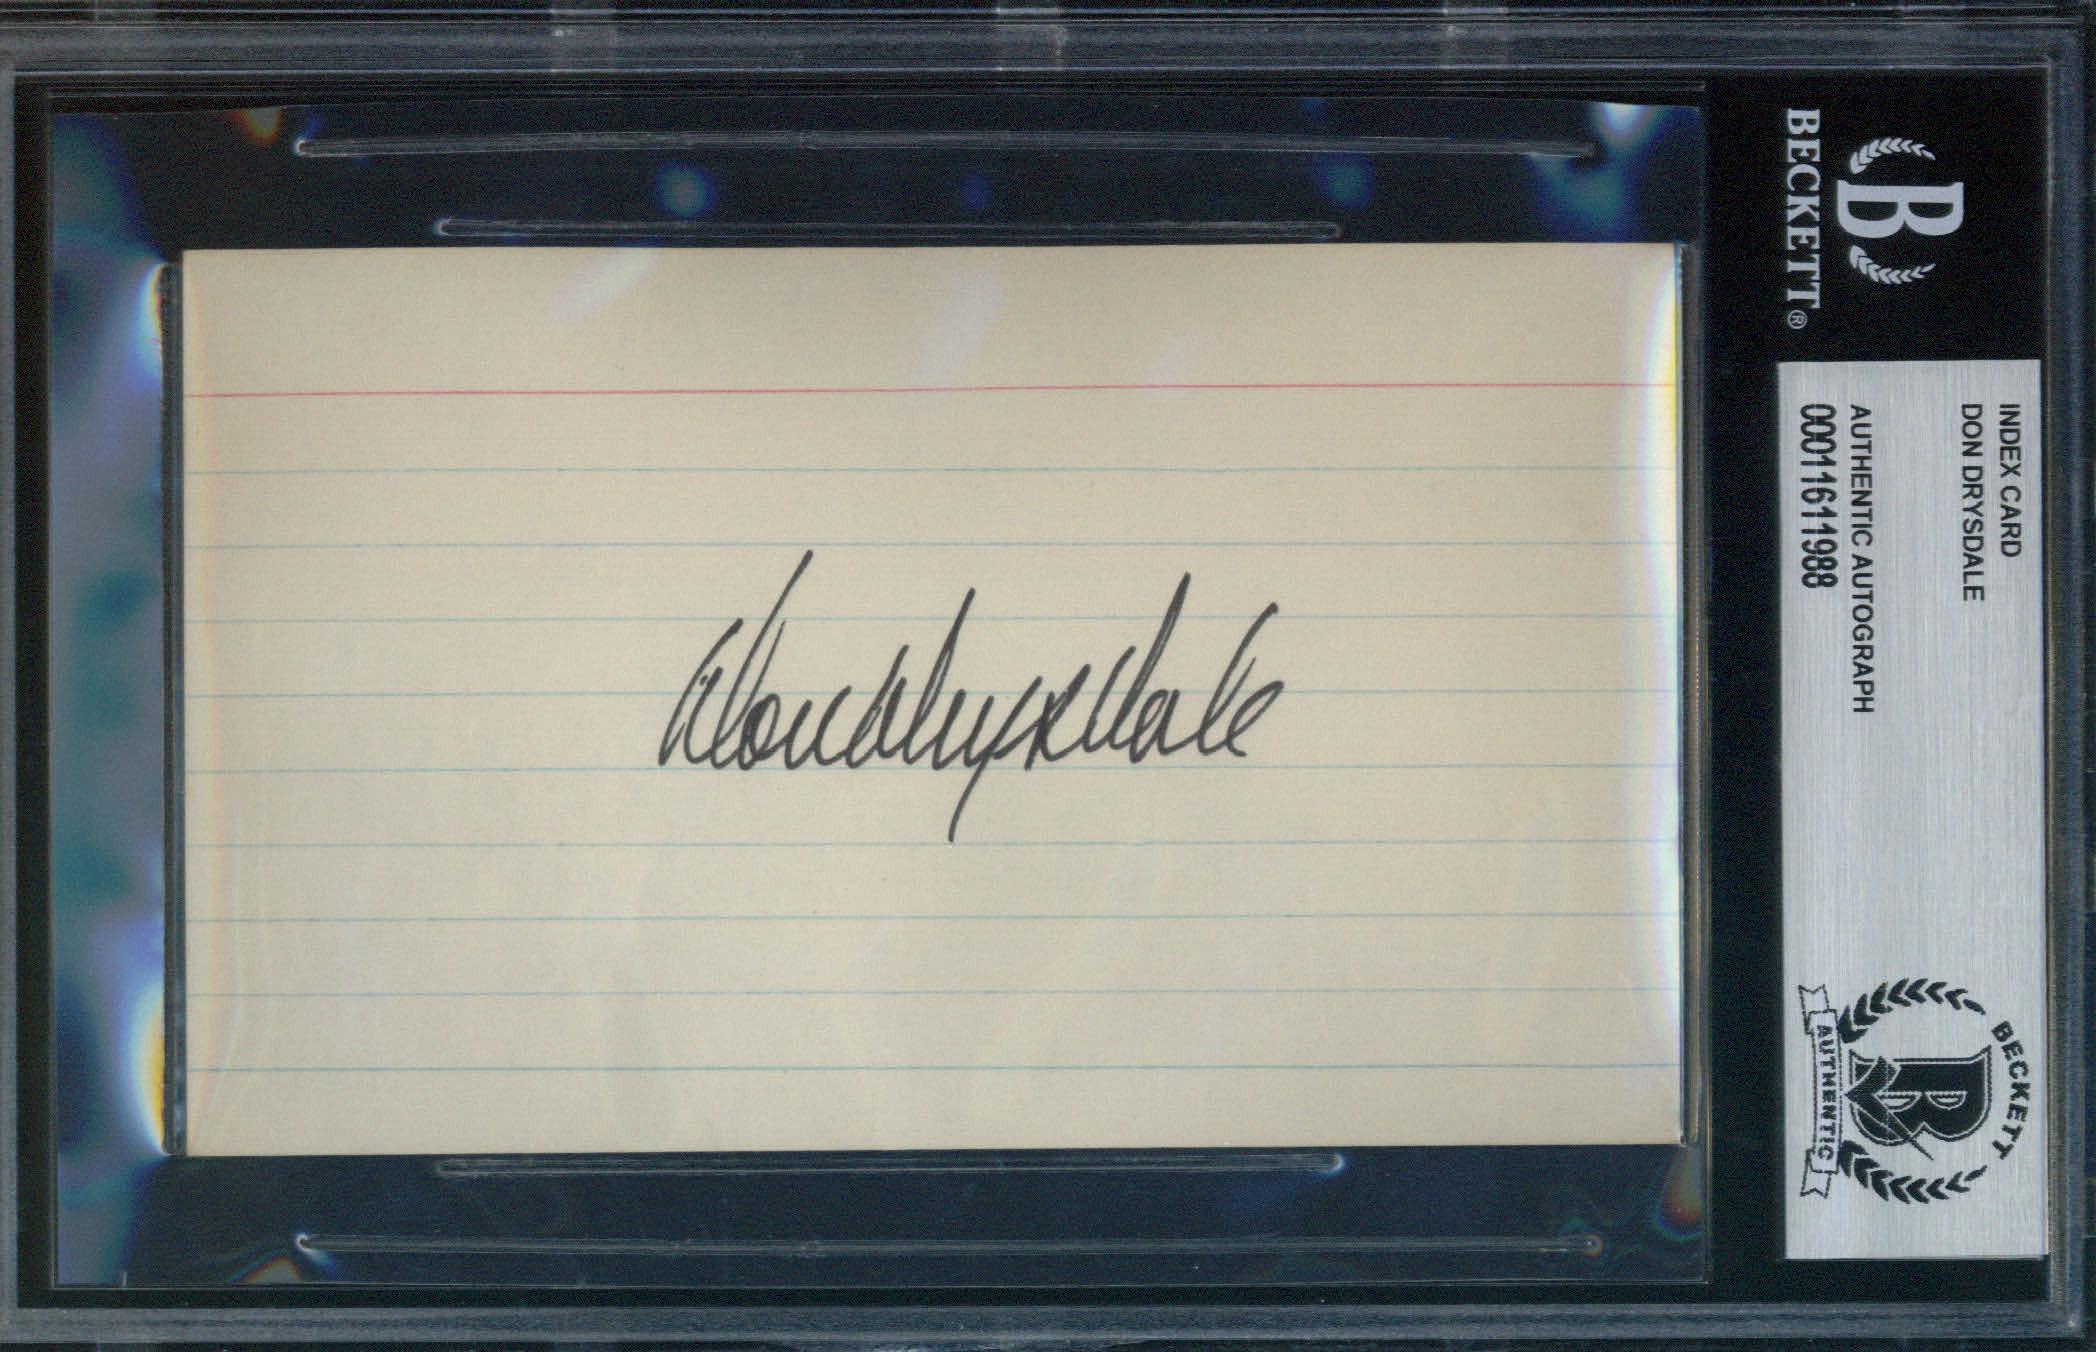 Don Drysdale Autographed Index Card BAS Authenticated